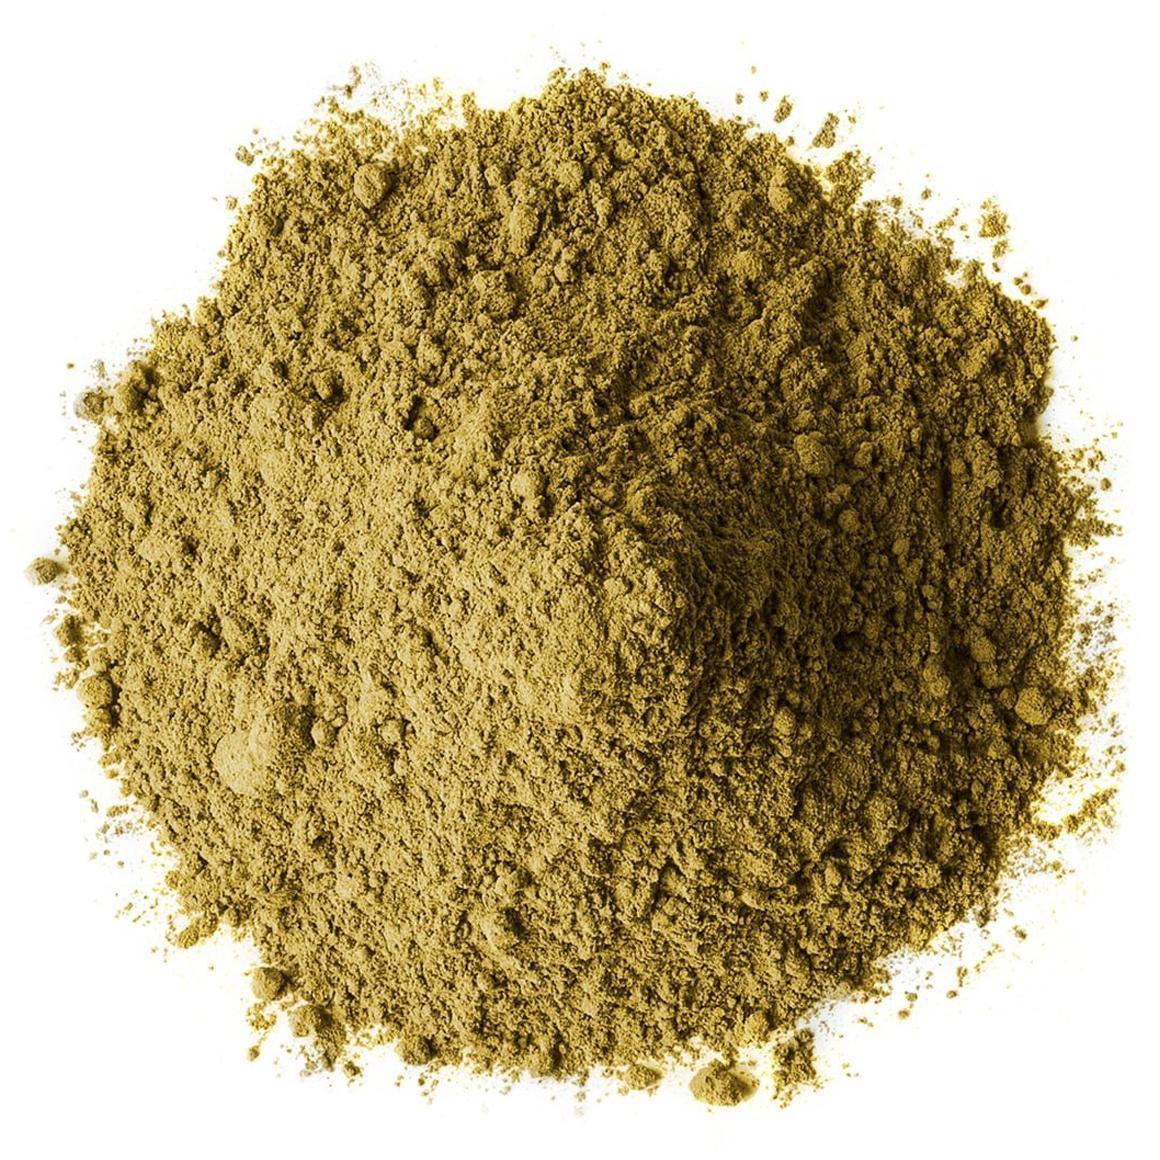 Kale Sprout Powder